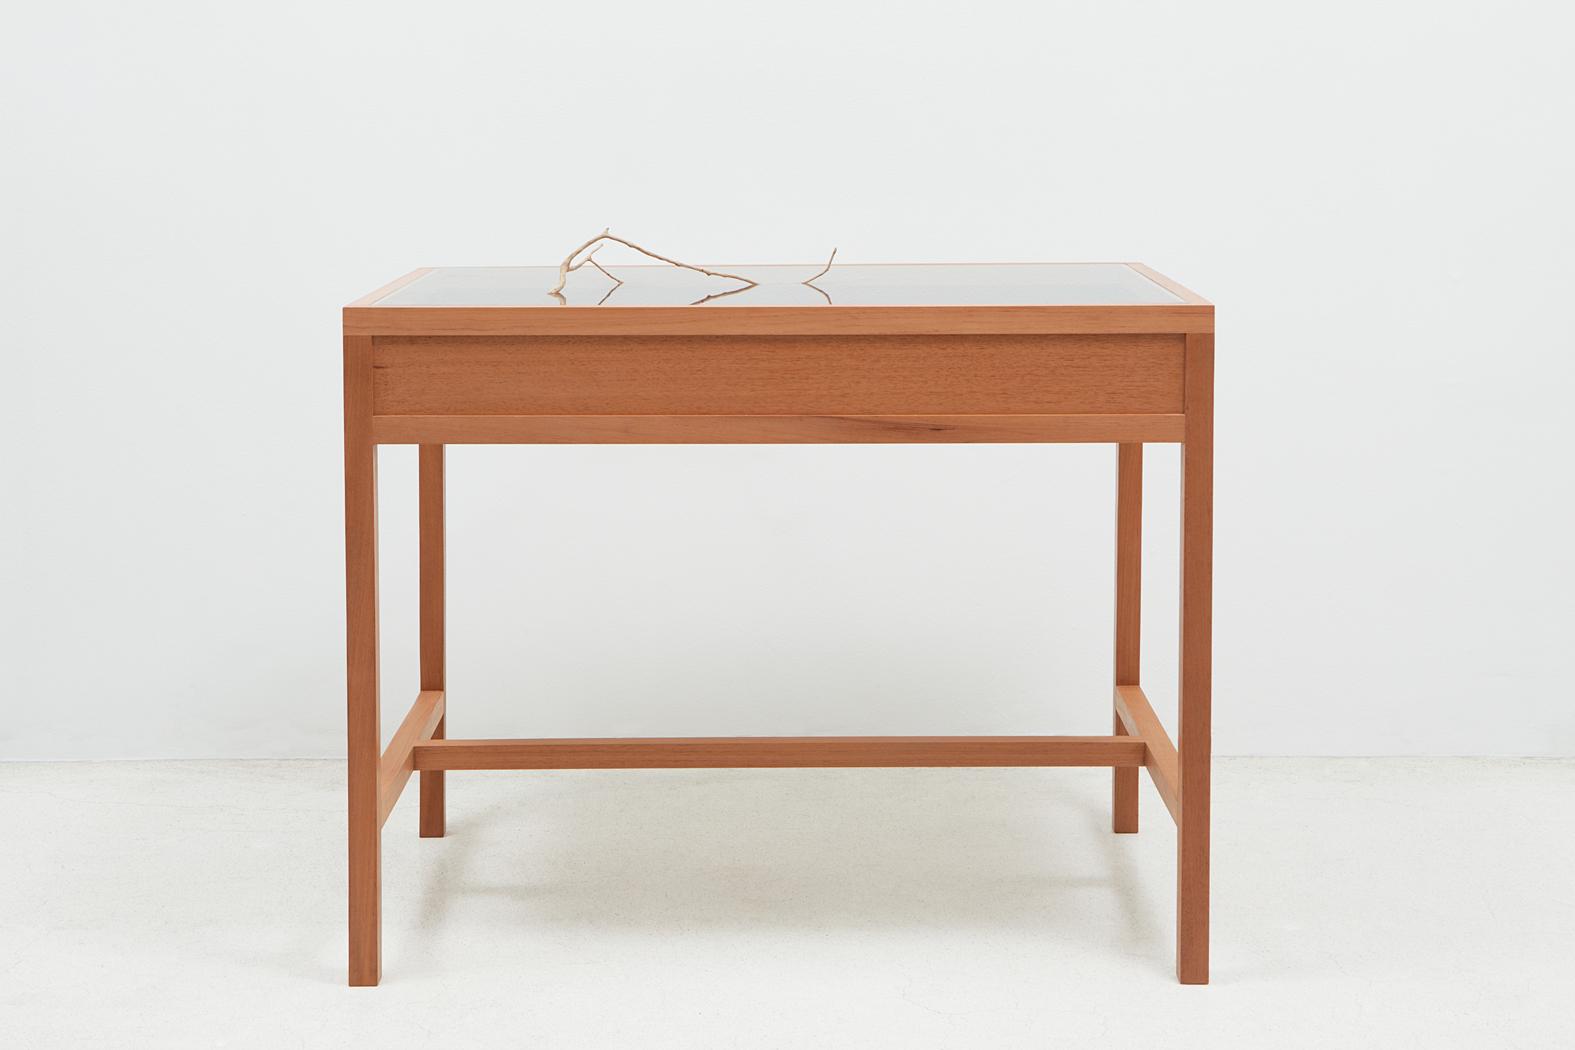 SEM VENTO/ WINDLESS (2013) tree branch and showcase, 90 x 100 x 70 cm